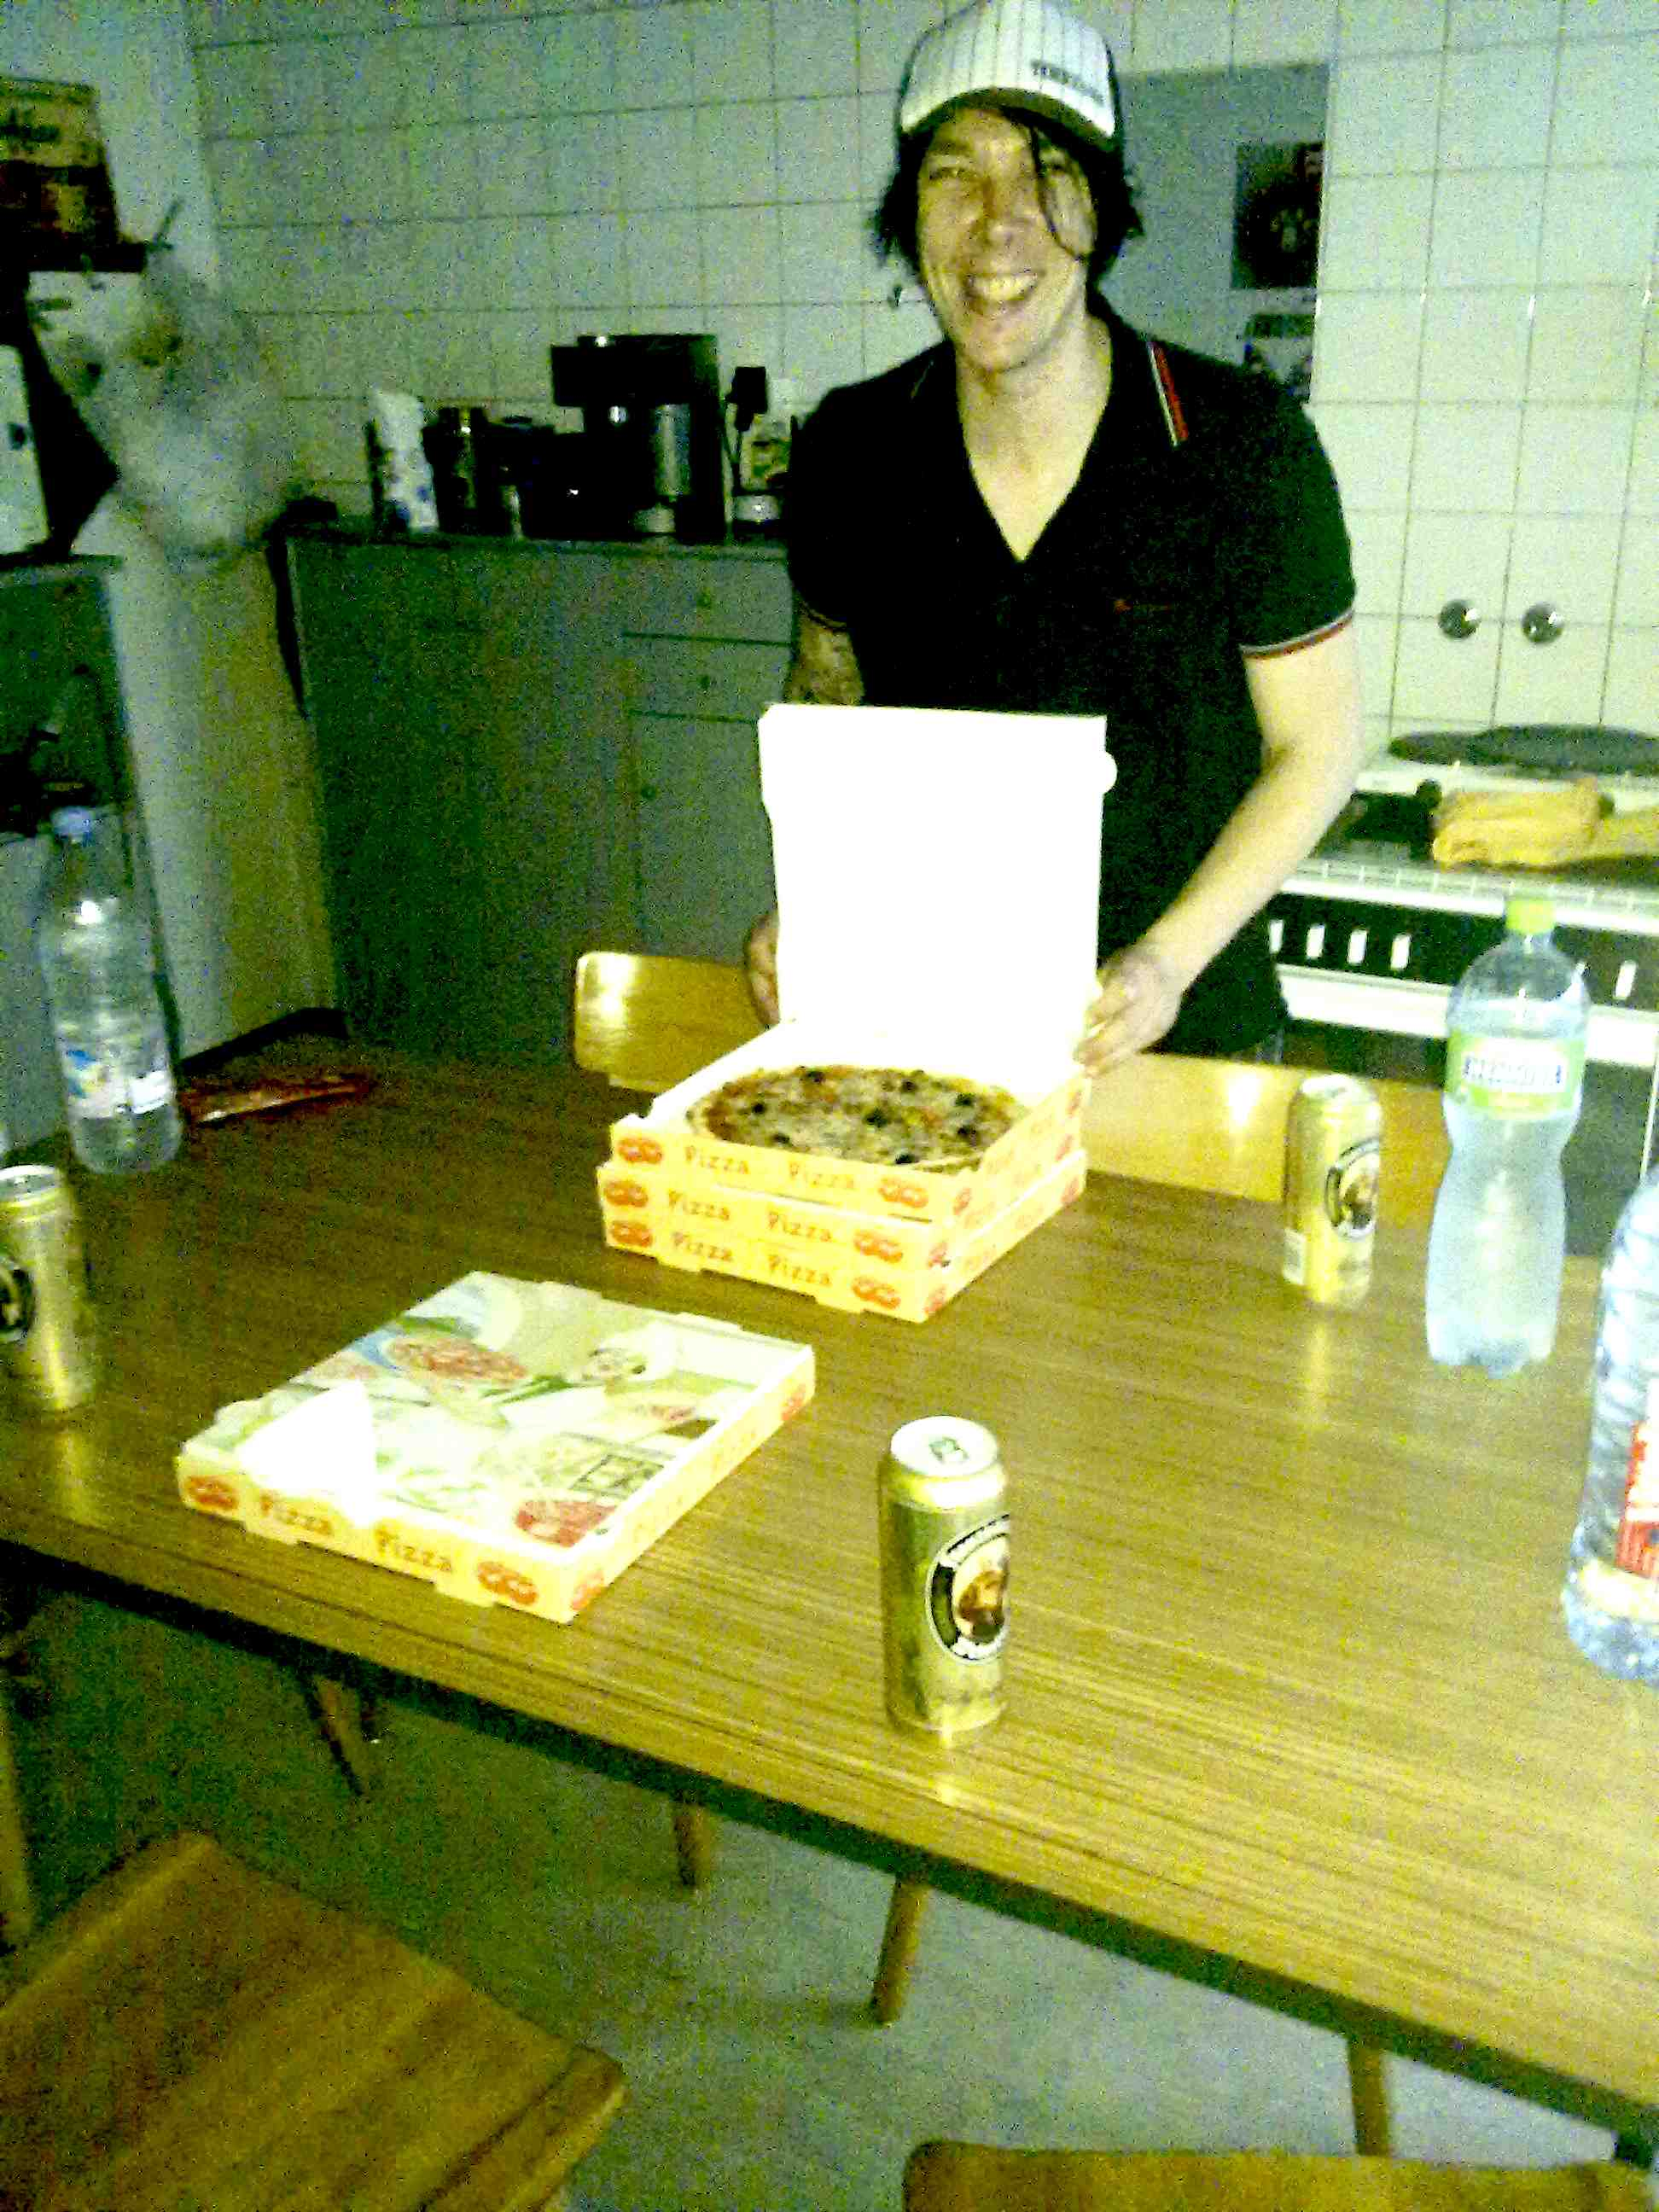 mdh_heinz_pizzamann.jpg